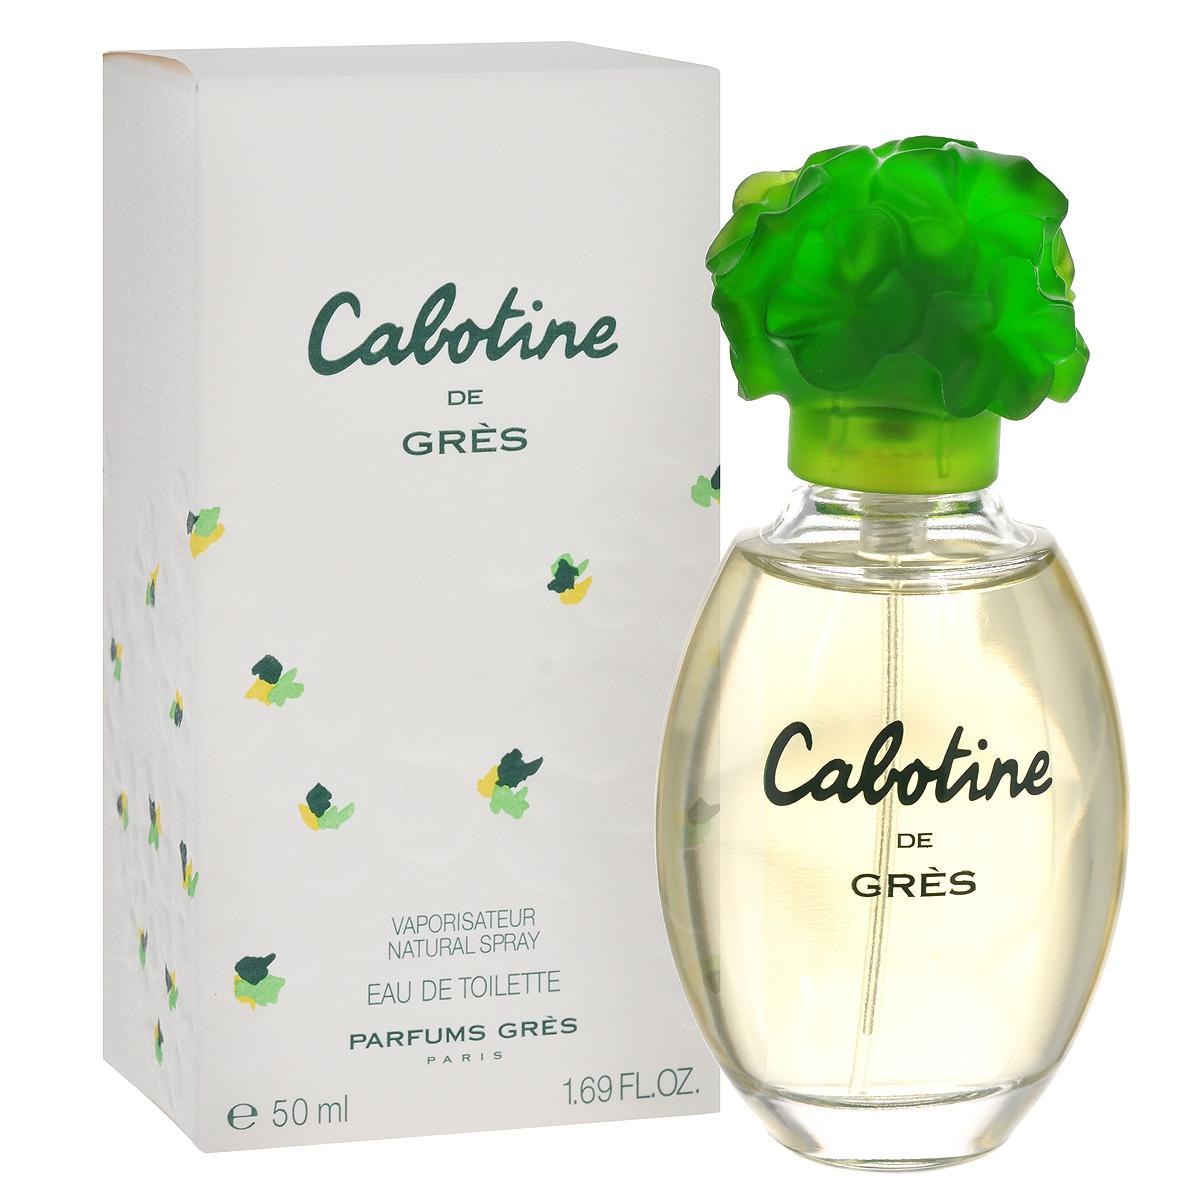 Gres ��������� ���� Cabotine, �������, 50 �� - GRES�00.4052.00��������� ���� Cabotine - ��� ������������, ������ ������ ������ ��� �������������� ������, ��������� � 1990 ����. ������ ���� � ���� ������� �������� � ����������� ������������ �������� �����. �� ���������� �������� �� ���� �������, ����� ���������� � ��������� �������� ������ ������������. �������� ����� ������ � ����� ������ ������, ������� ���������� ����� � ����������. �������� ���� ������� � ������� �������� ���������� ������ � �������� Gres Cabotine! ������������� ������� : ���������, ���������. �������� ������� : ������� ����: ��������, ������ ���������, �����, ������. ���� ������: ����, ��������, ��������, �����-�����. ���� ������: ������, ����, ������, ���� �����. �������� ����� �������, ������, ������!